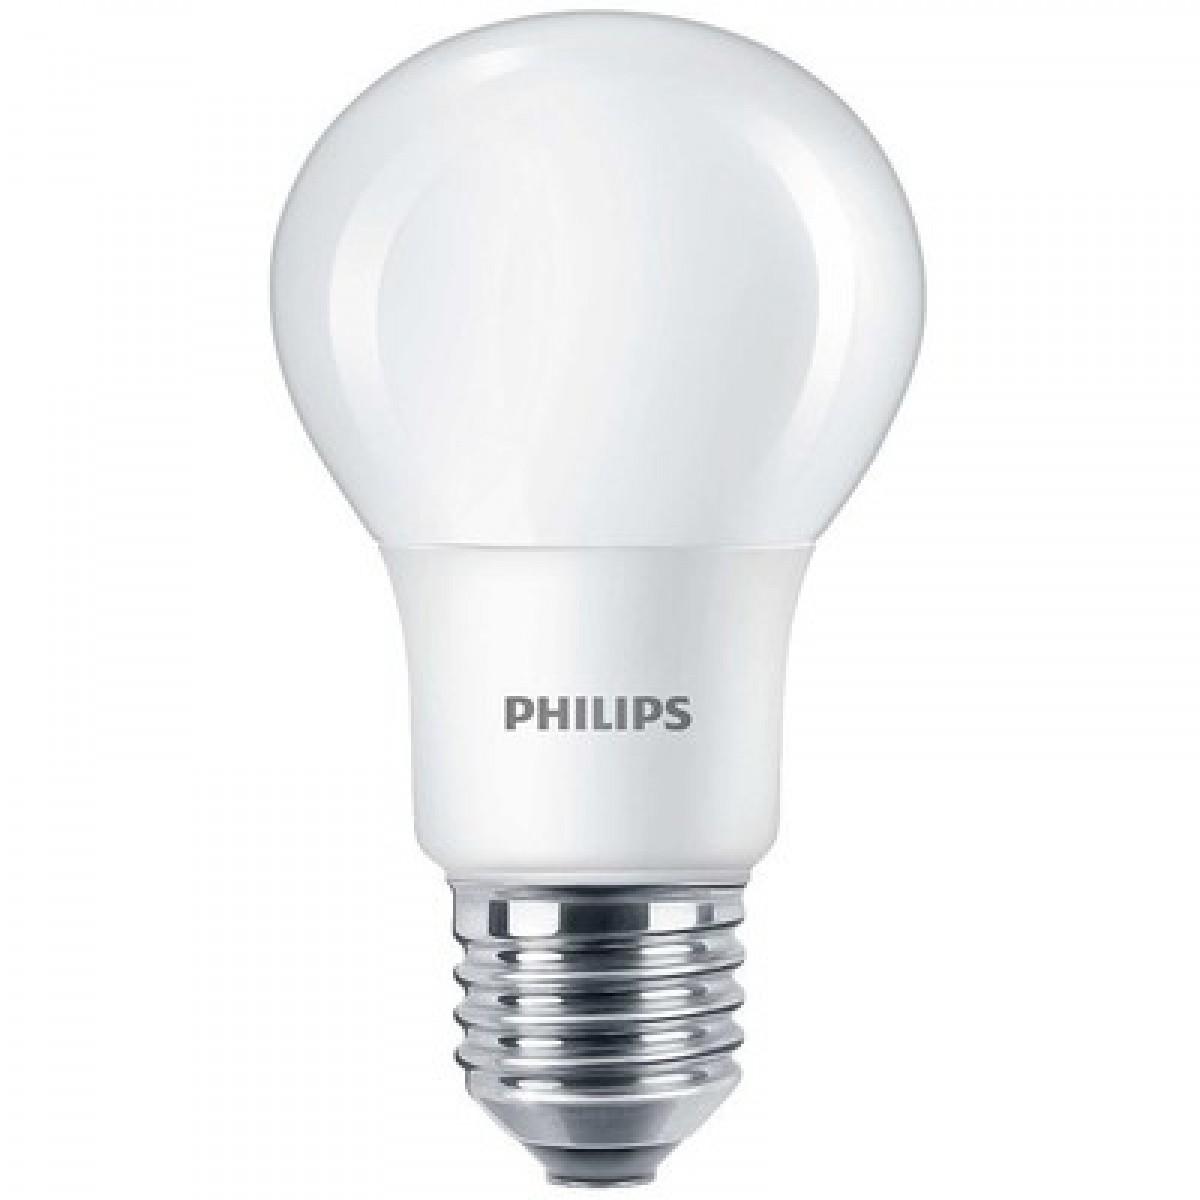 PHILIPS LED pærer standard mat 8W (60W)